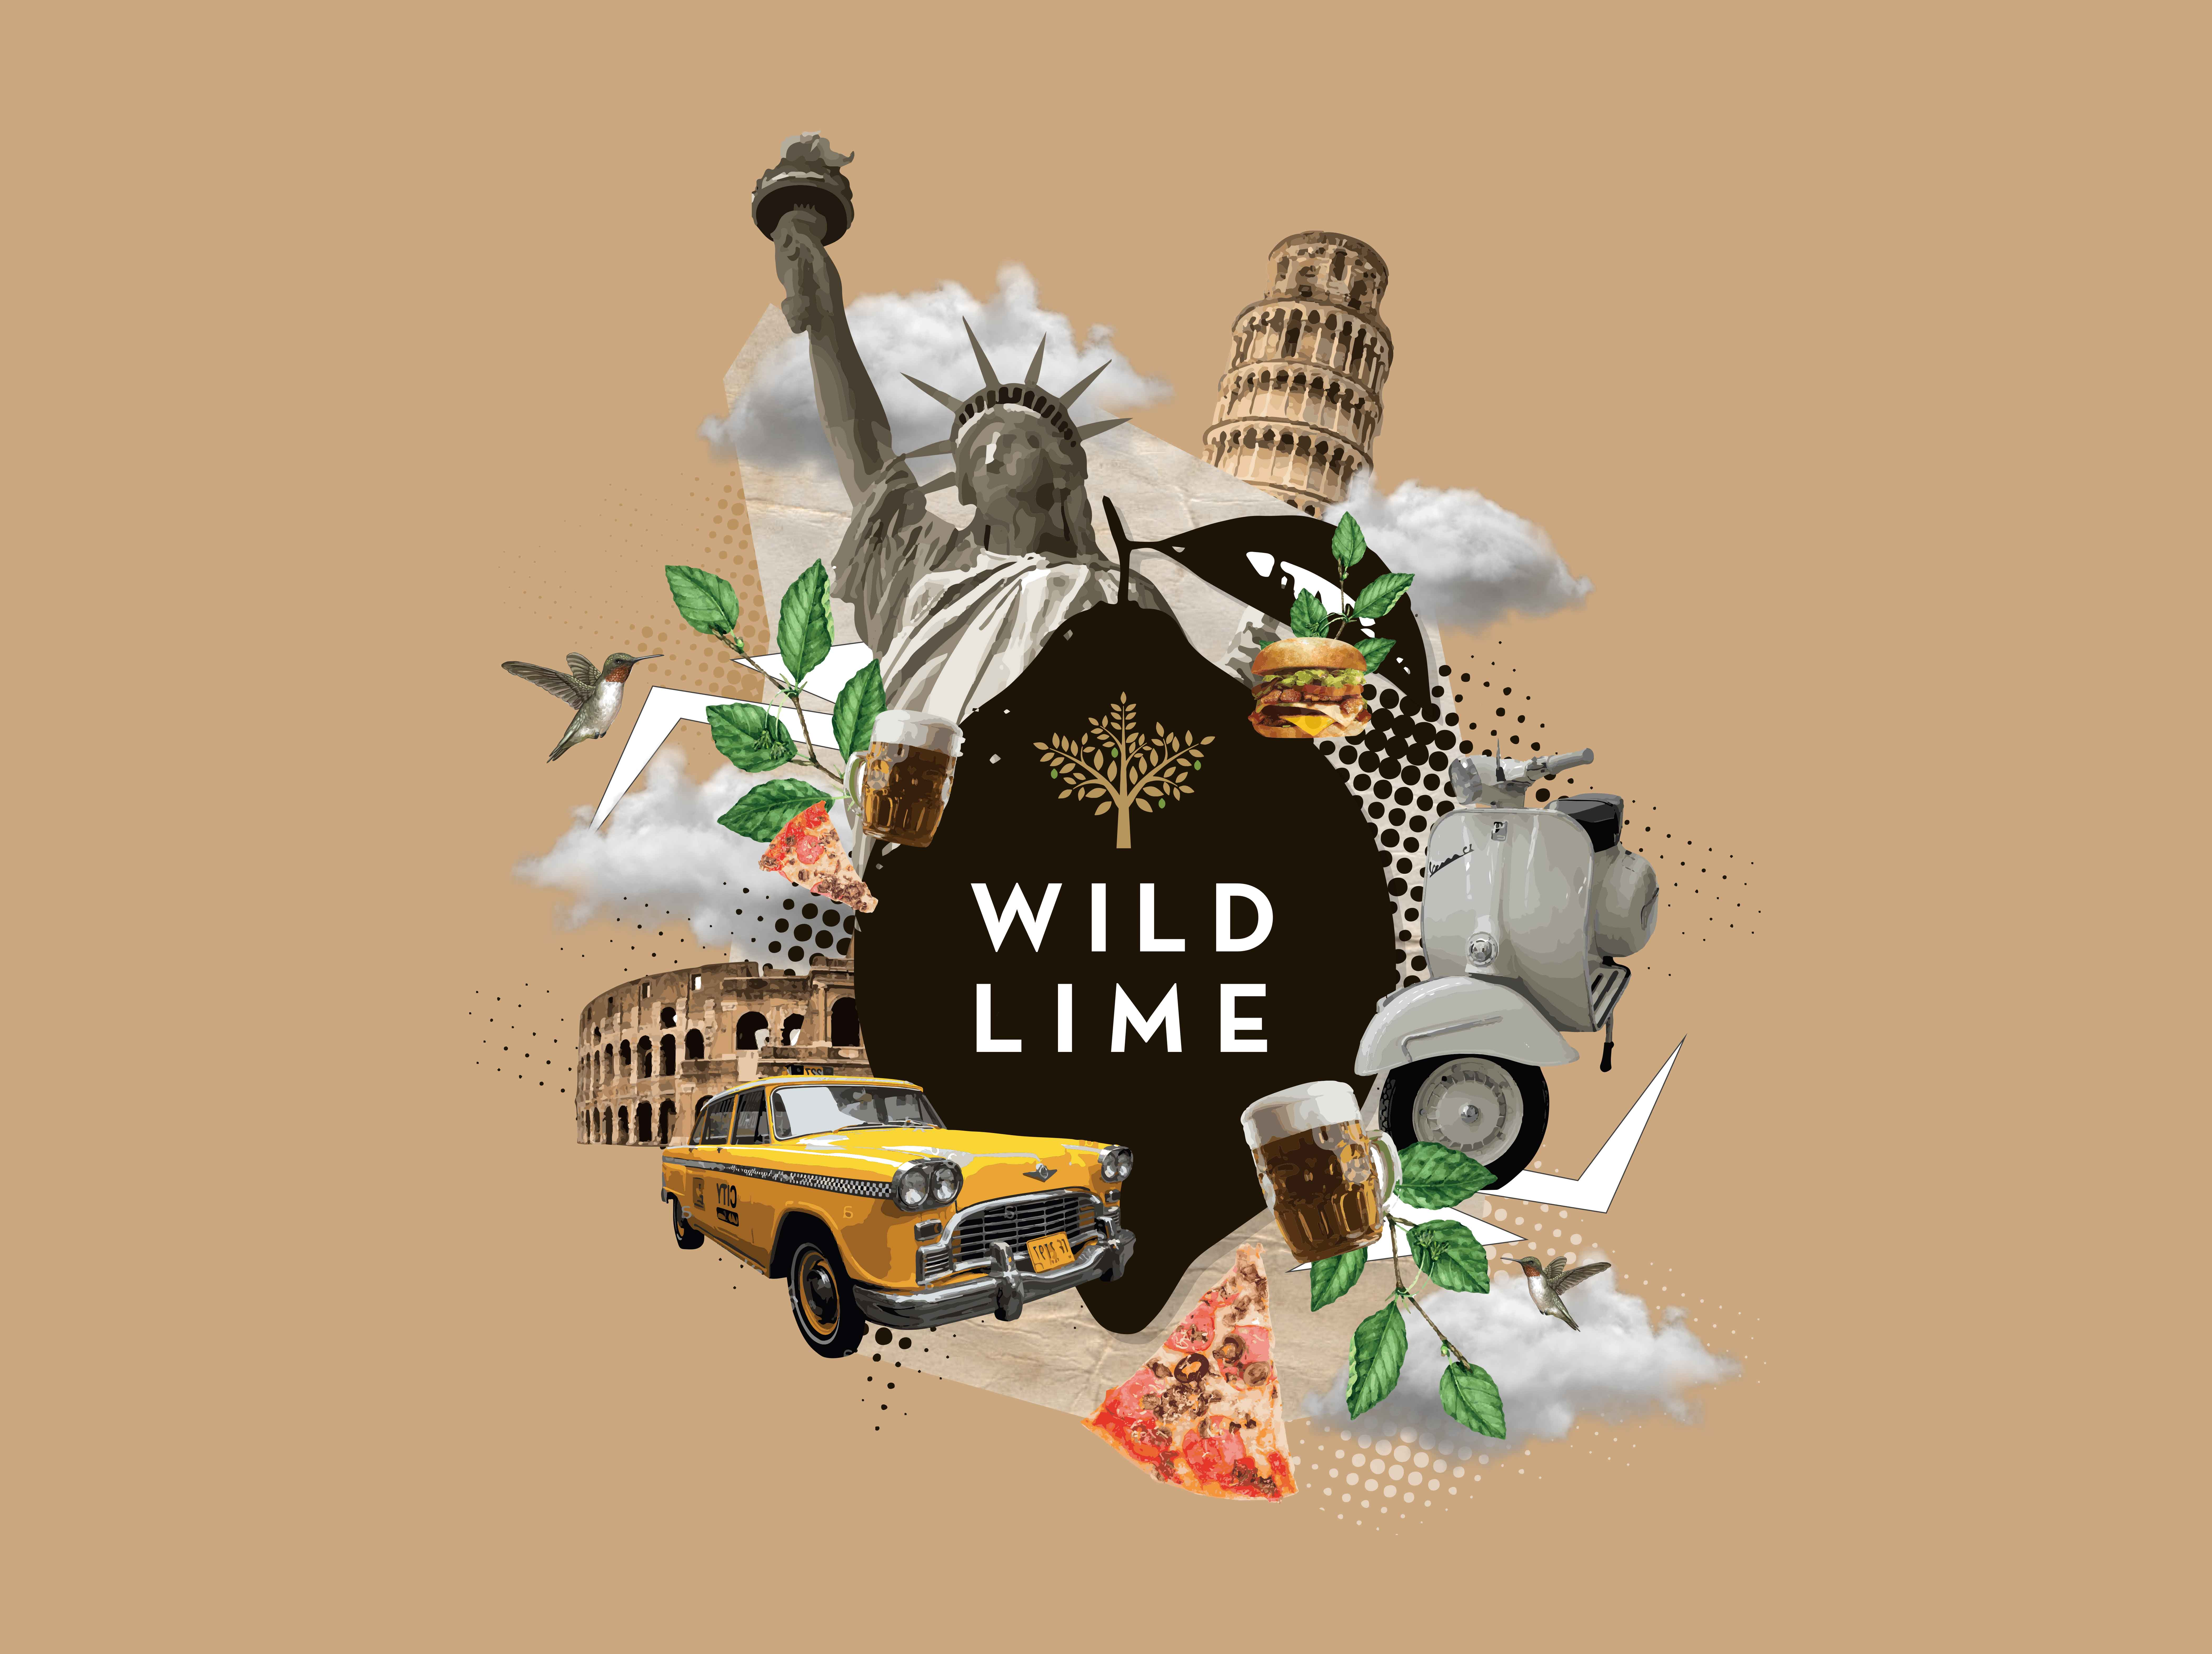 wild lime.